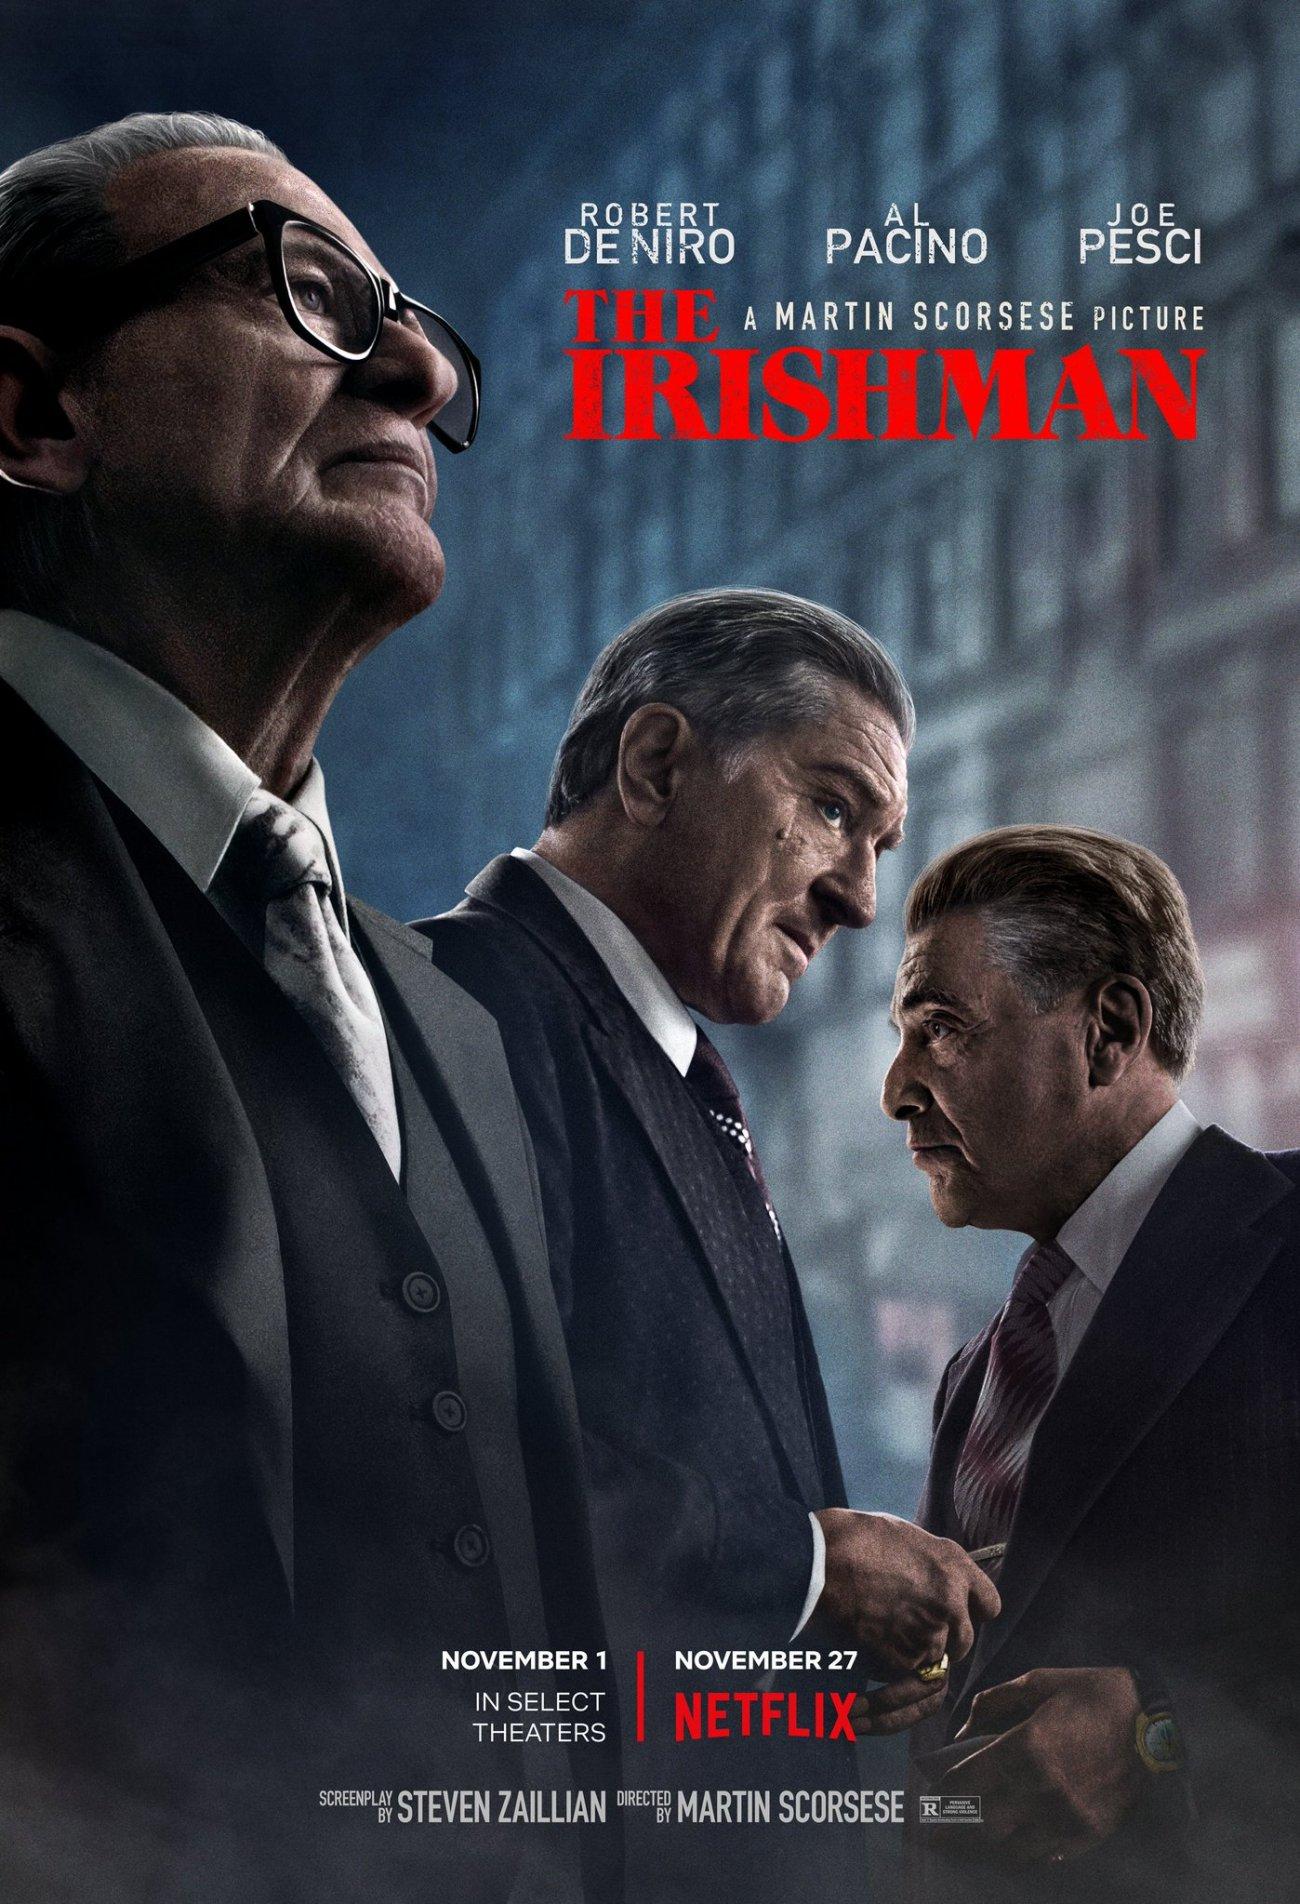 Póster de The Irishman (2019). Imagen: The Irishman Movie Twitter (@Irishman_Movie).